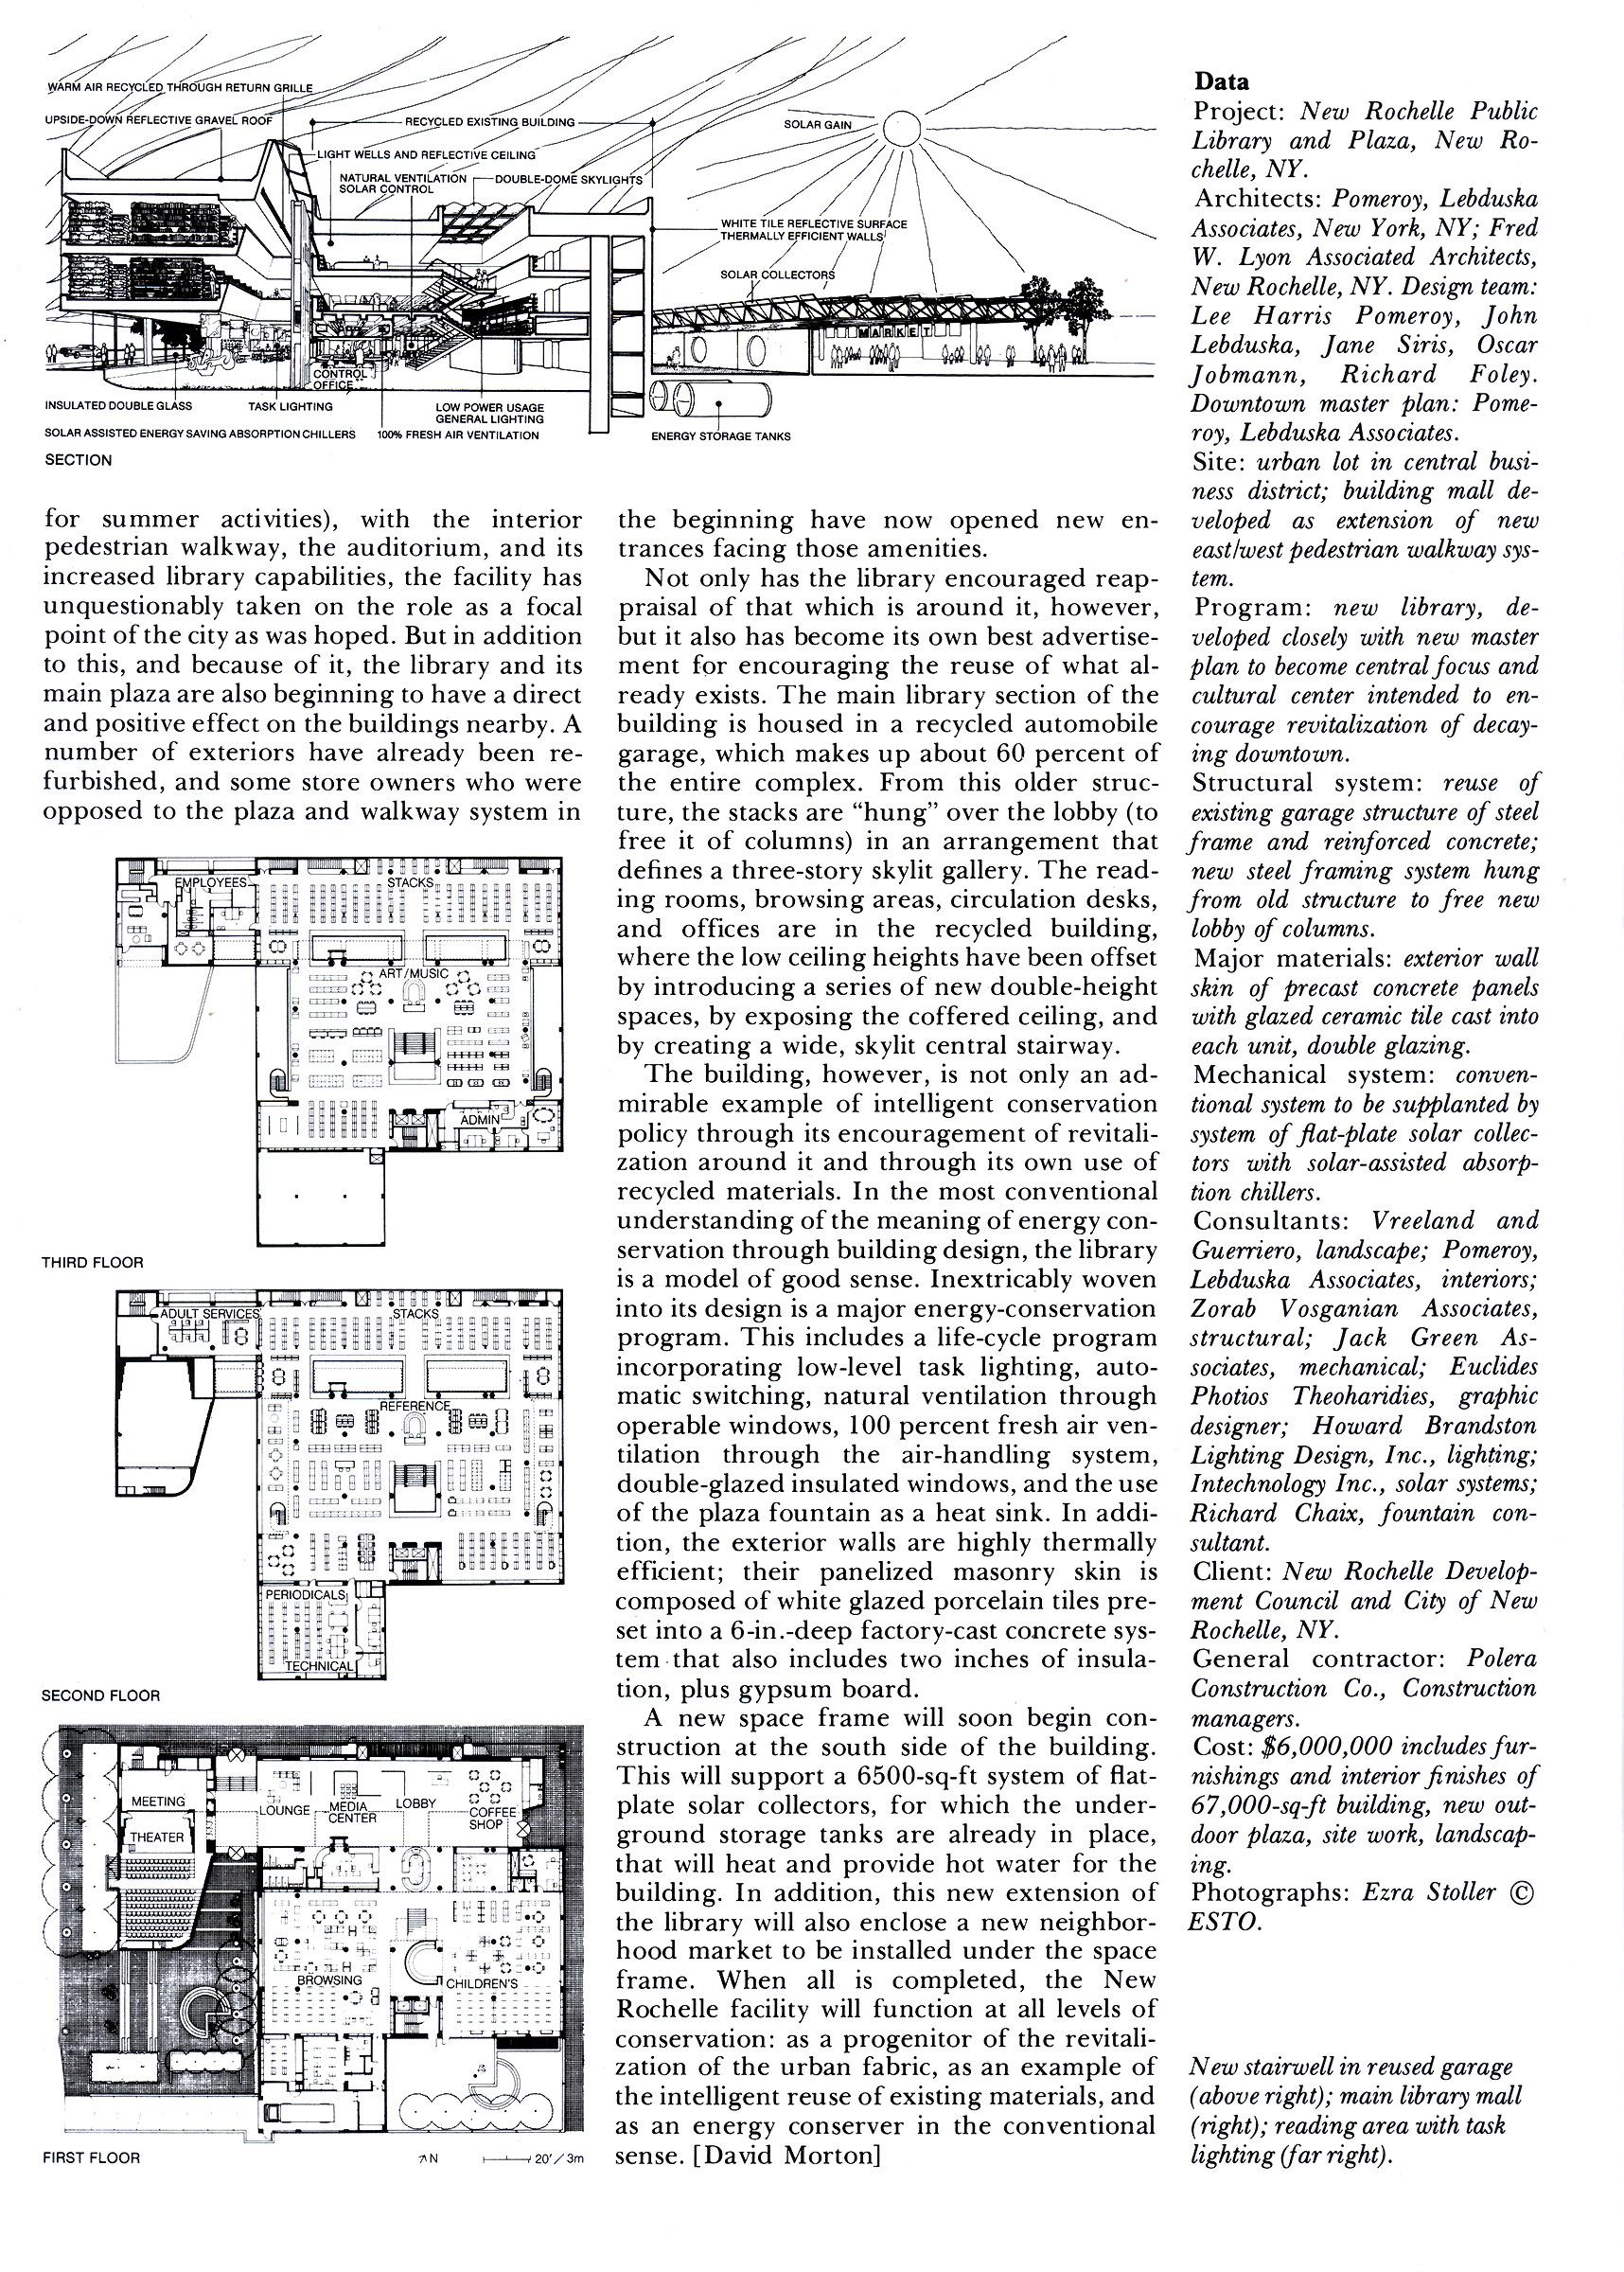 New Rochelle Page 4.jpg